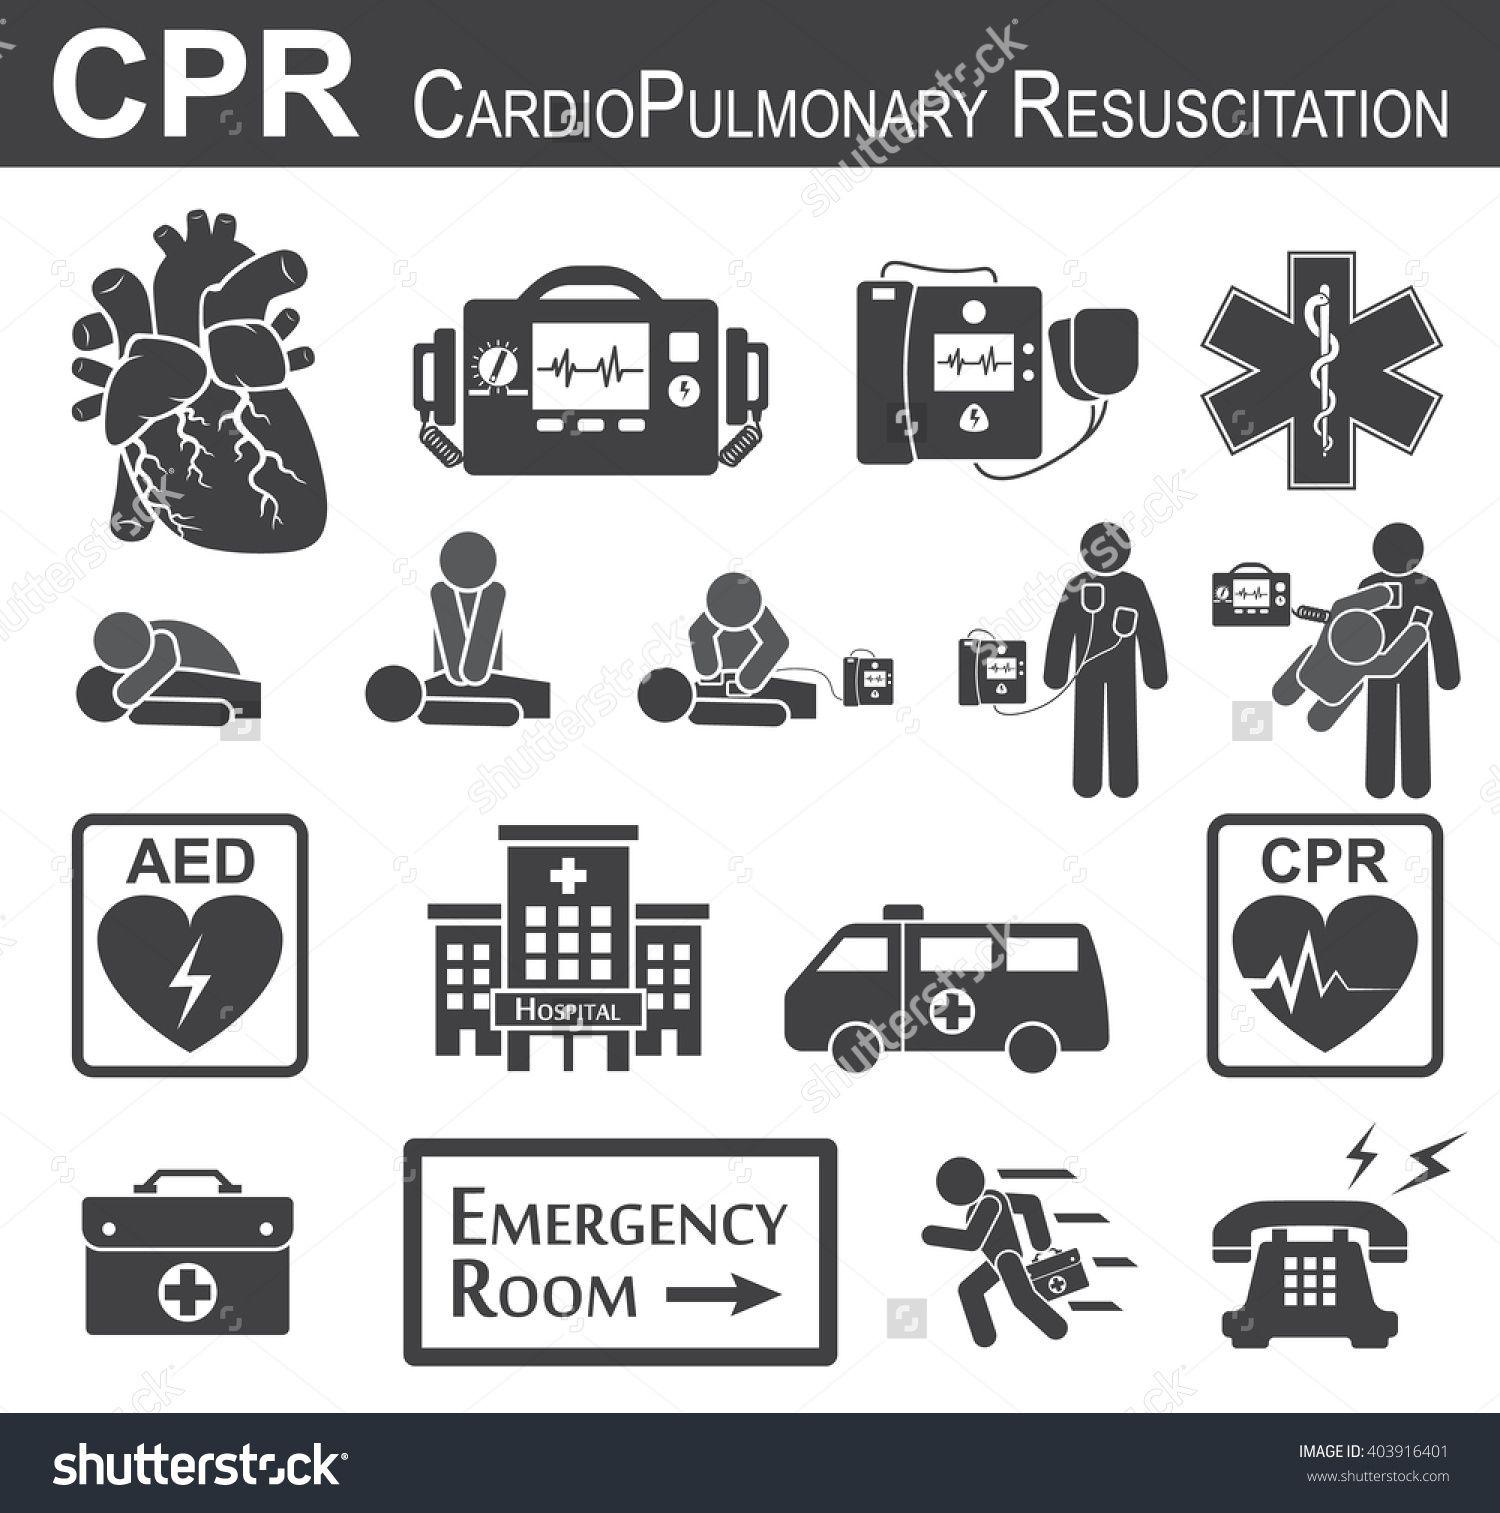 Colorado Cardiac Cpr: CPR ( Cardiopulmonary Resuscitation ) Icon ( Black & White